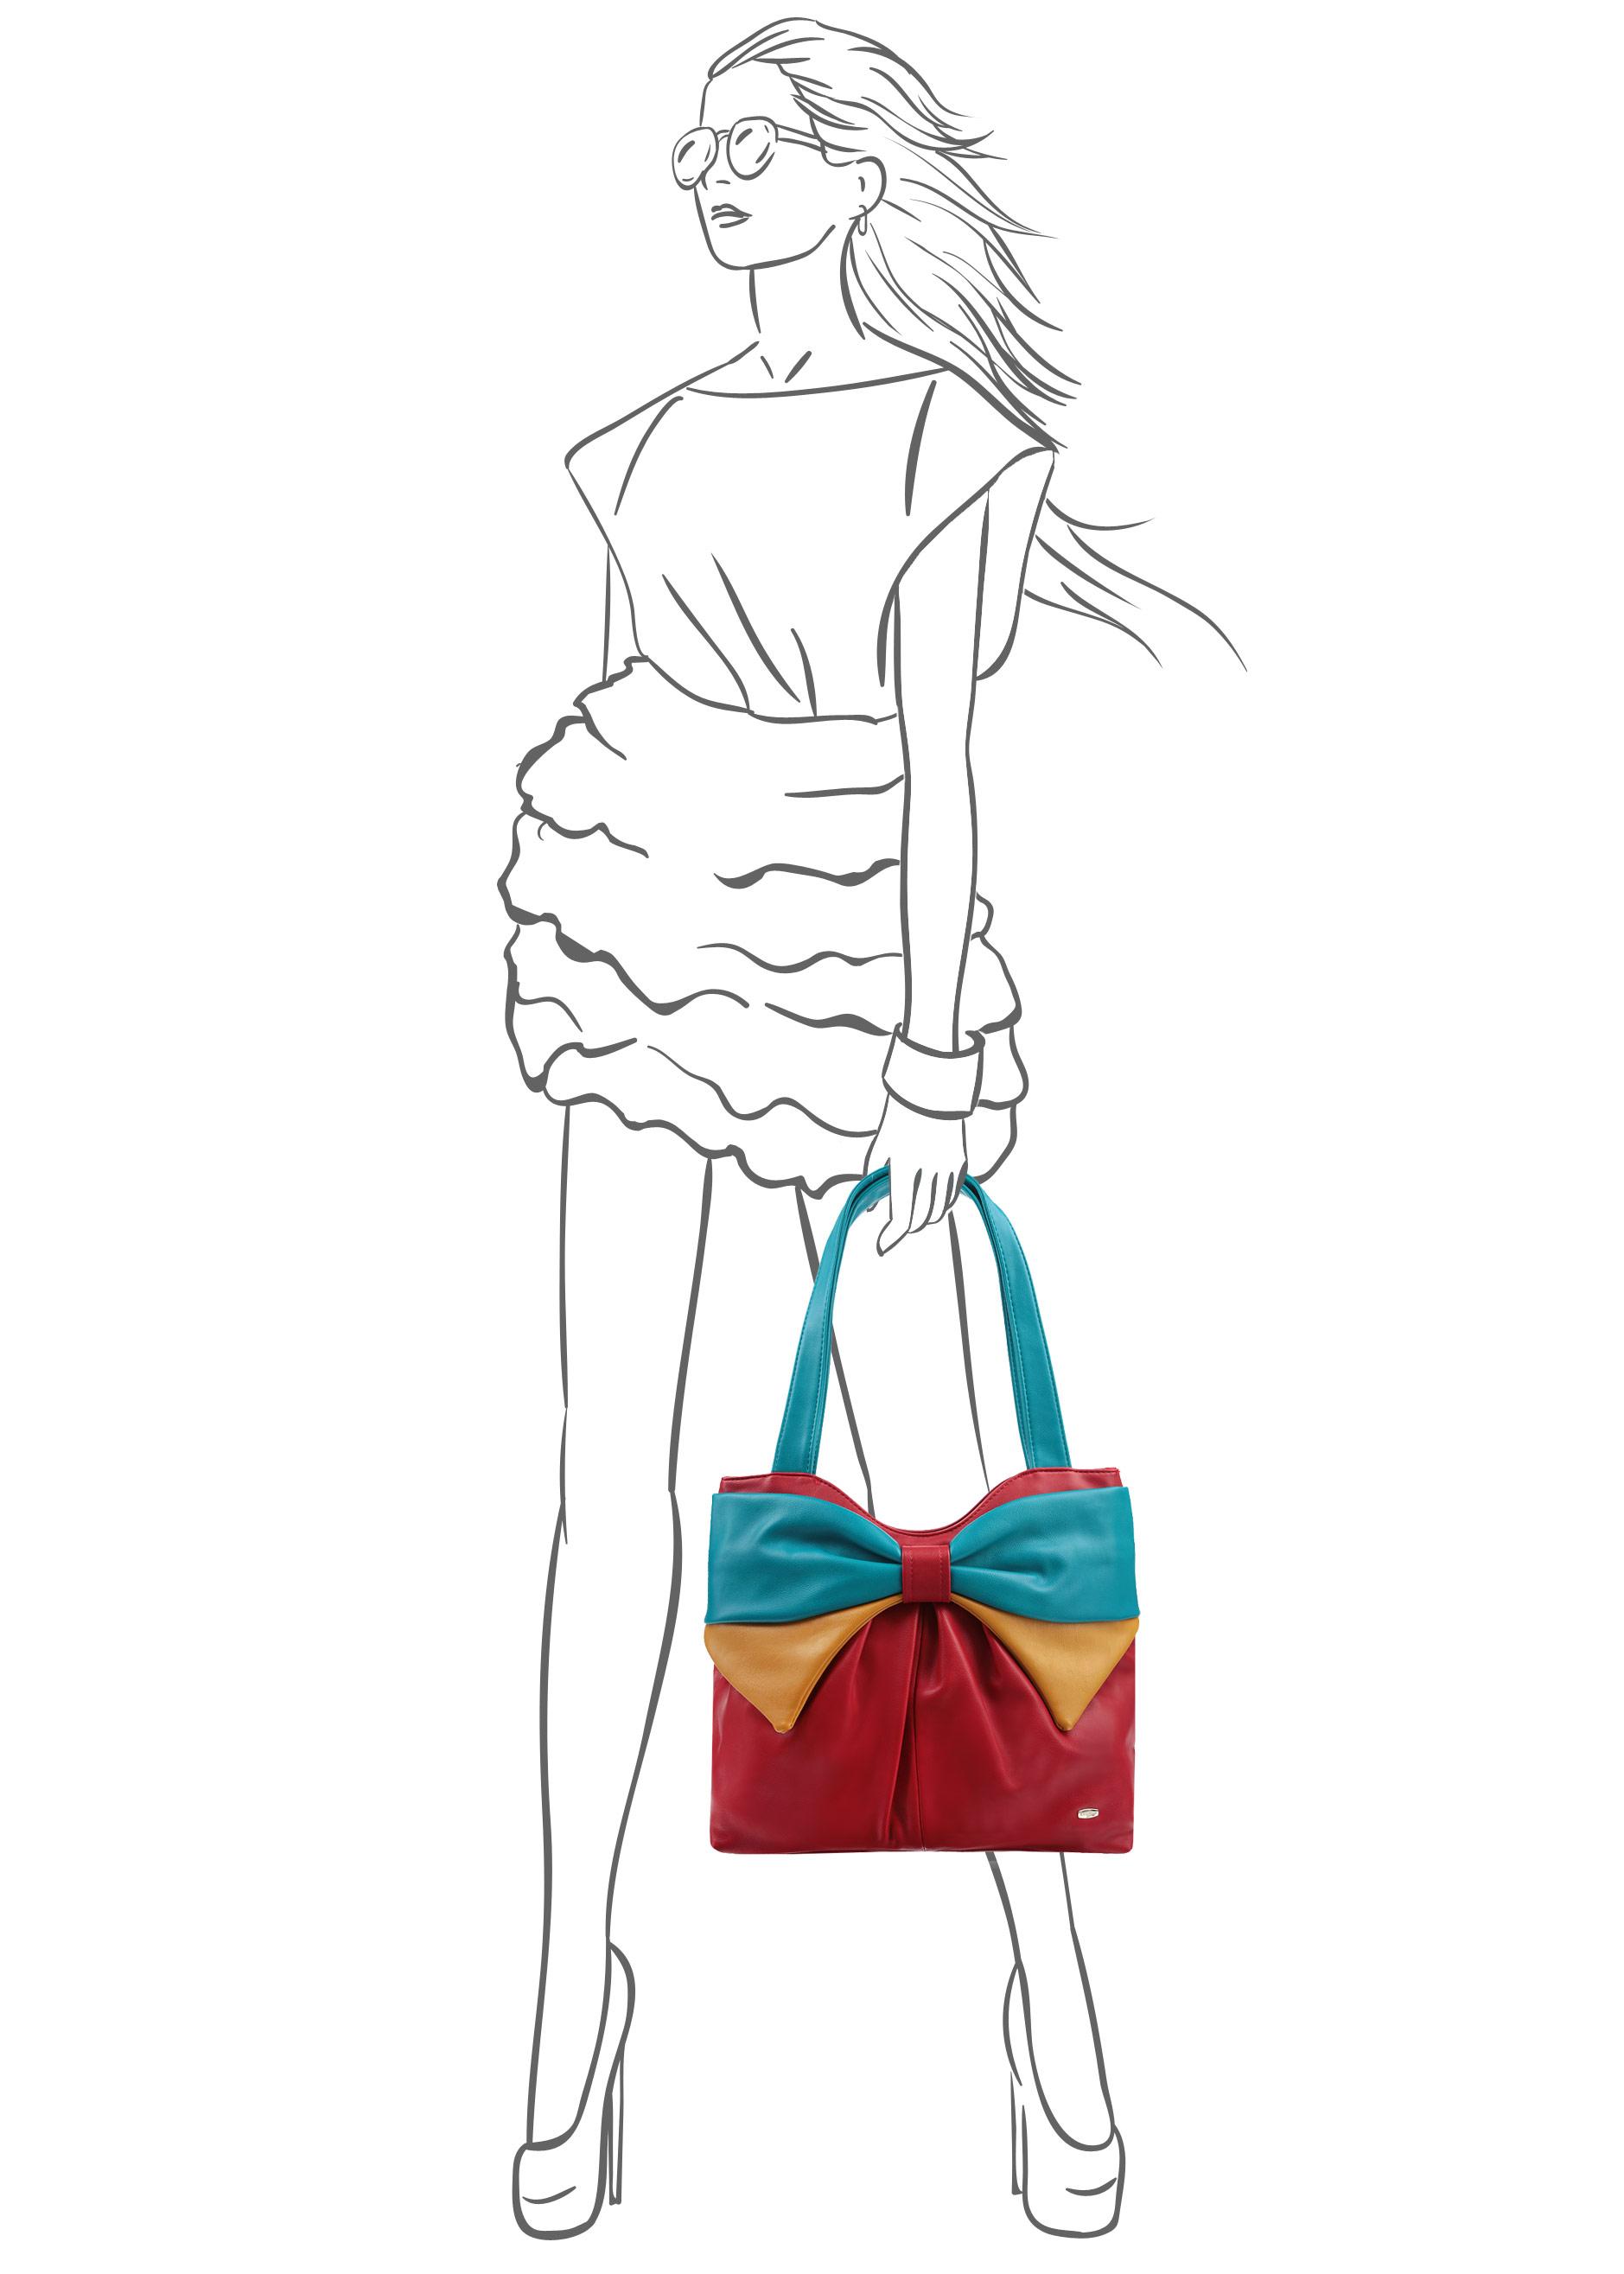 Сумка женская Leighton, цвет: красный, желтый, голубой. 86307-1589/17/1589/20/1589/22 ( 86307-1589/17/1589/20/1589/22 )